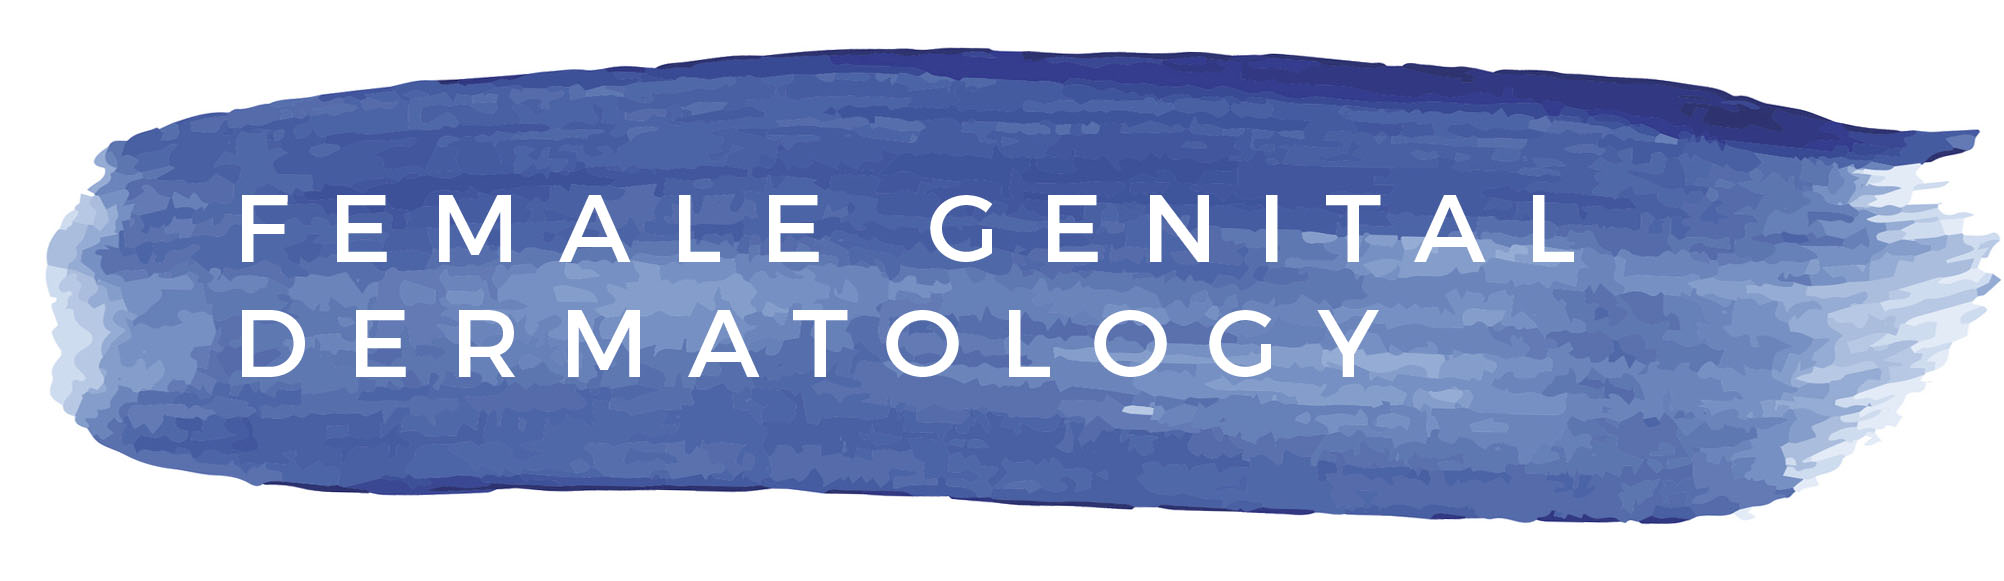 Dr Liz Dawes-Higgs is a medical expert in the field of Female Genital Dermatology.